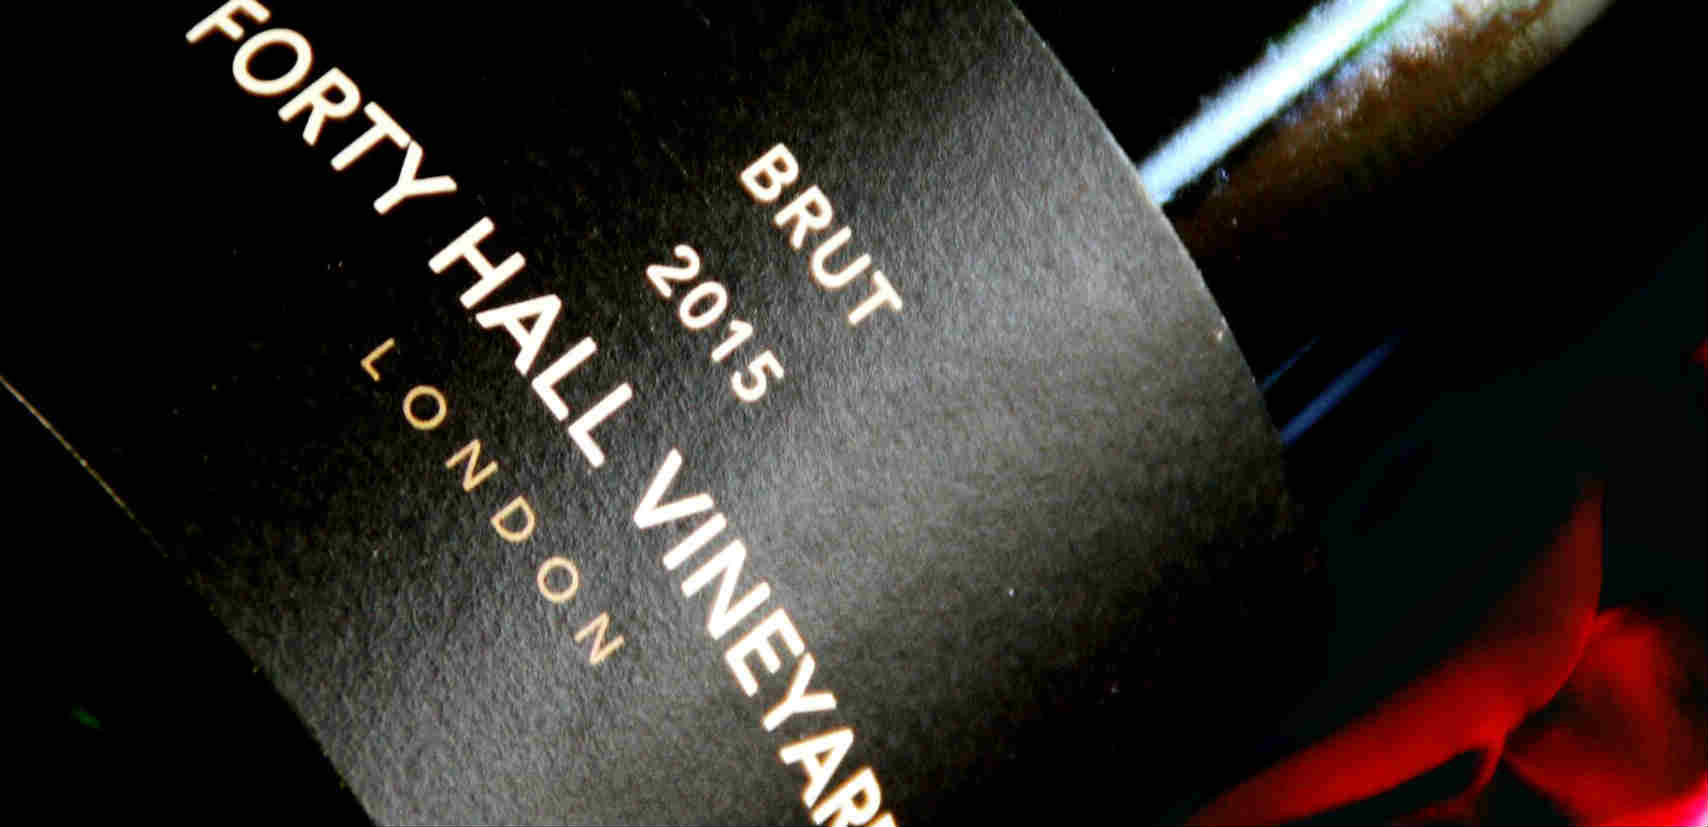 Vegan wine from London